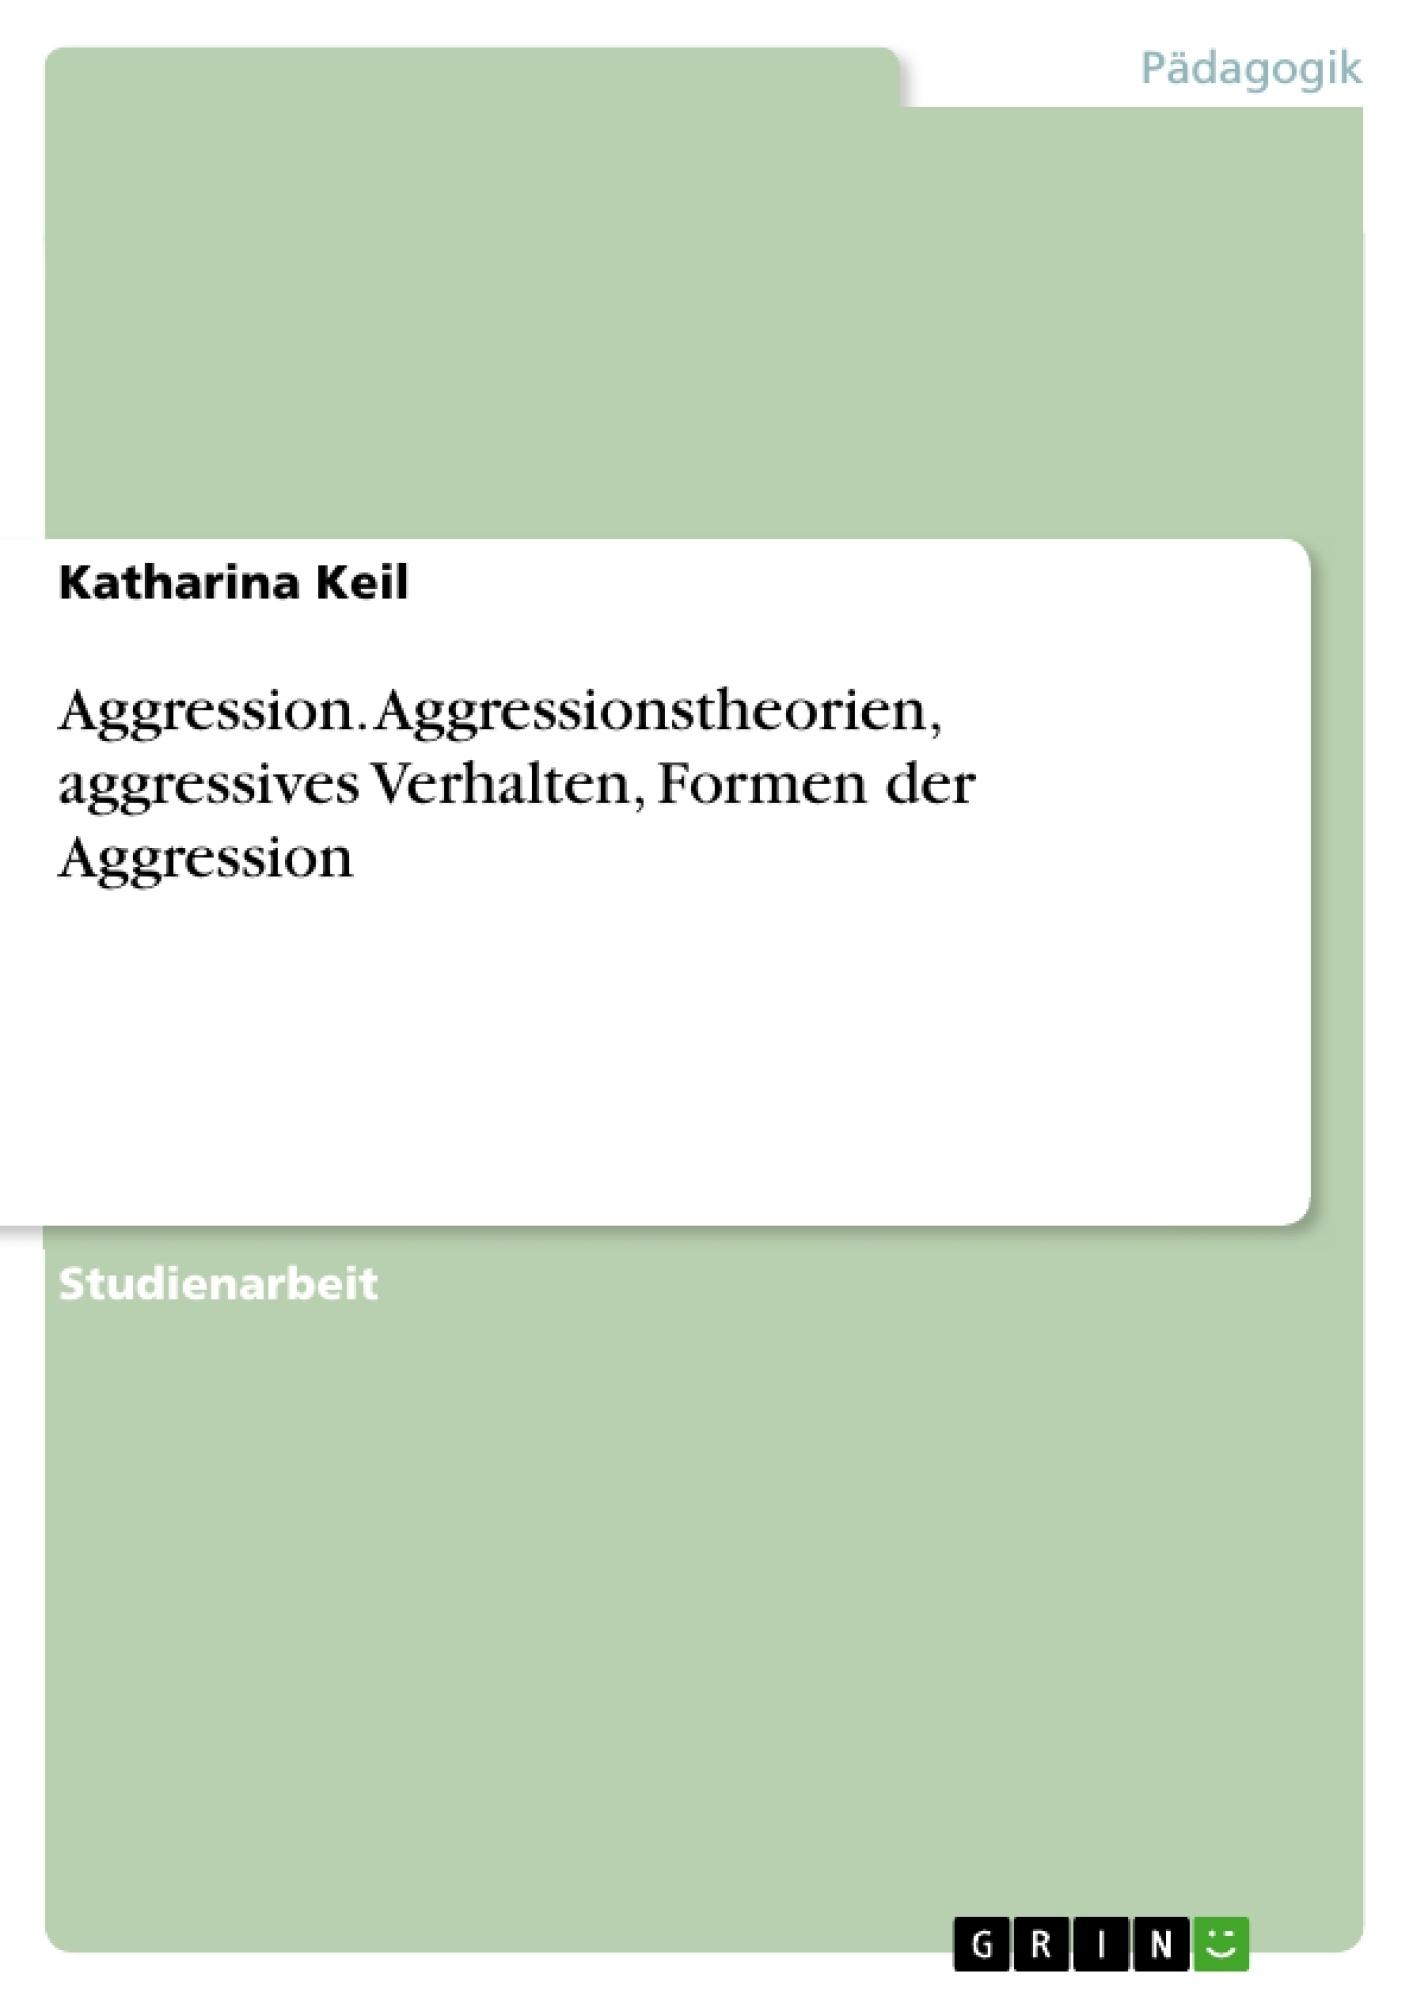 Titel: Aggression. Aggressionstheorien, aggressives Verhalten, Formen der Aggression